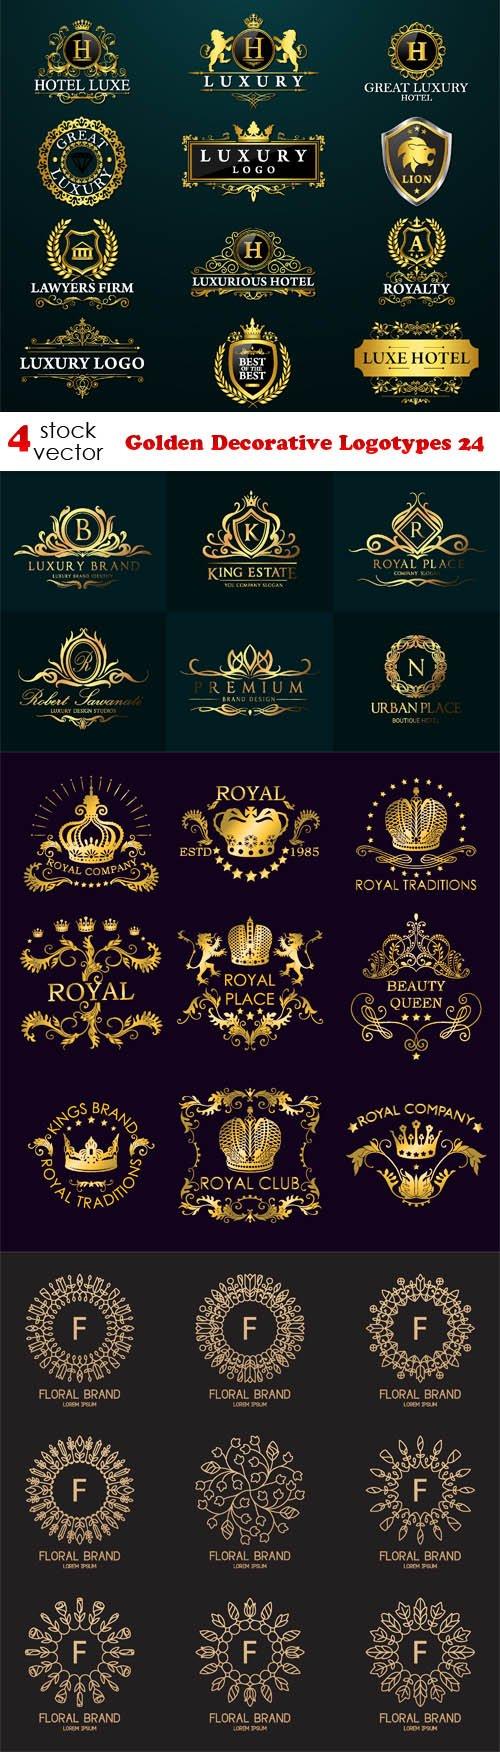 Vectors - Golden Decorative Logotypes 24